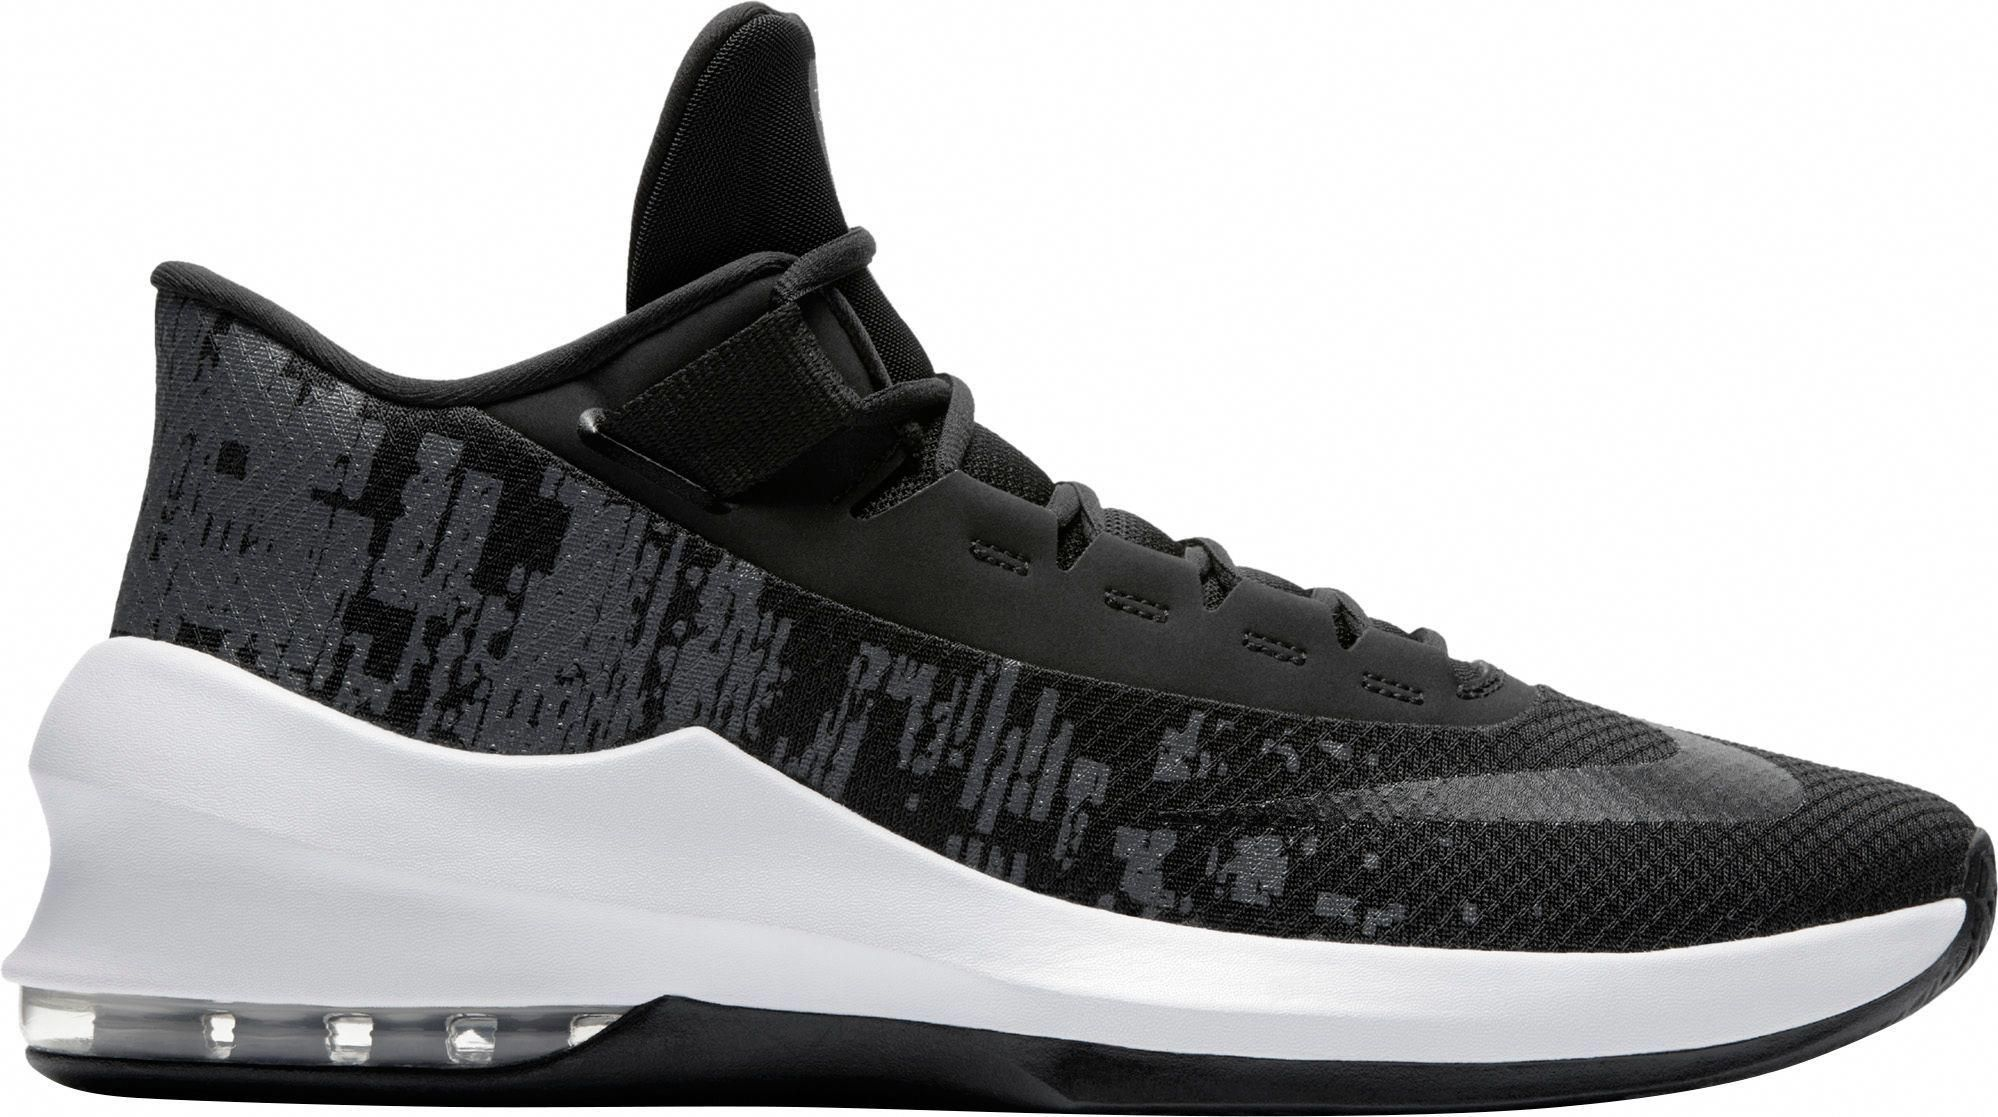 8f711b6f6b8355 Nike Men s Air Max Infuriate 2 Mid Basketball Shoes